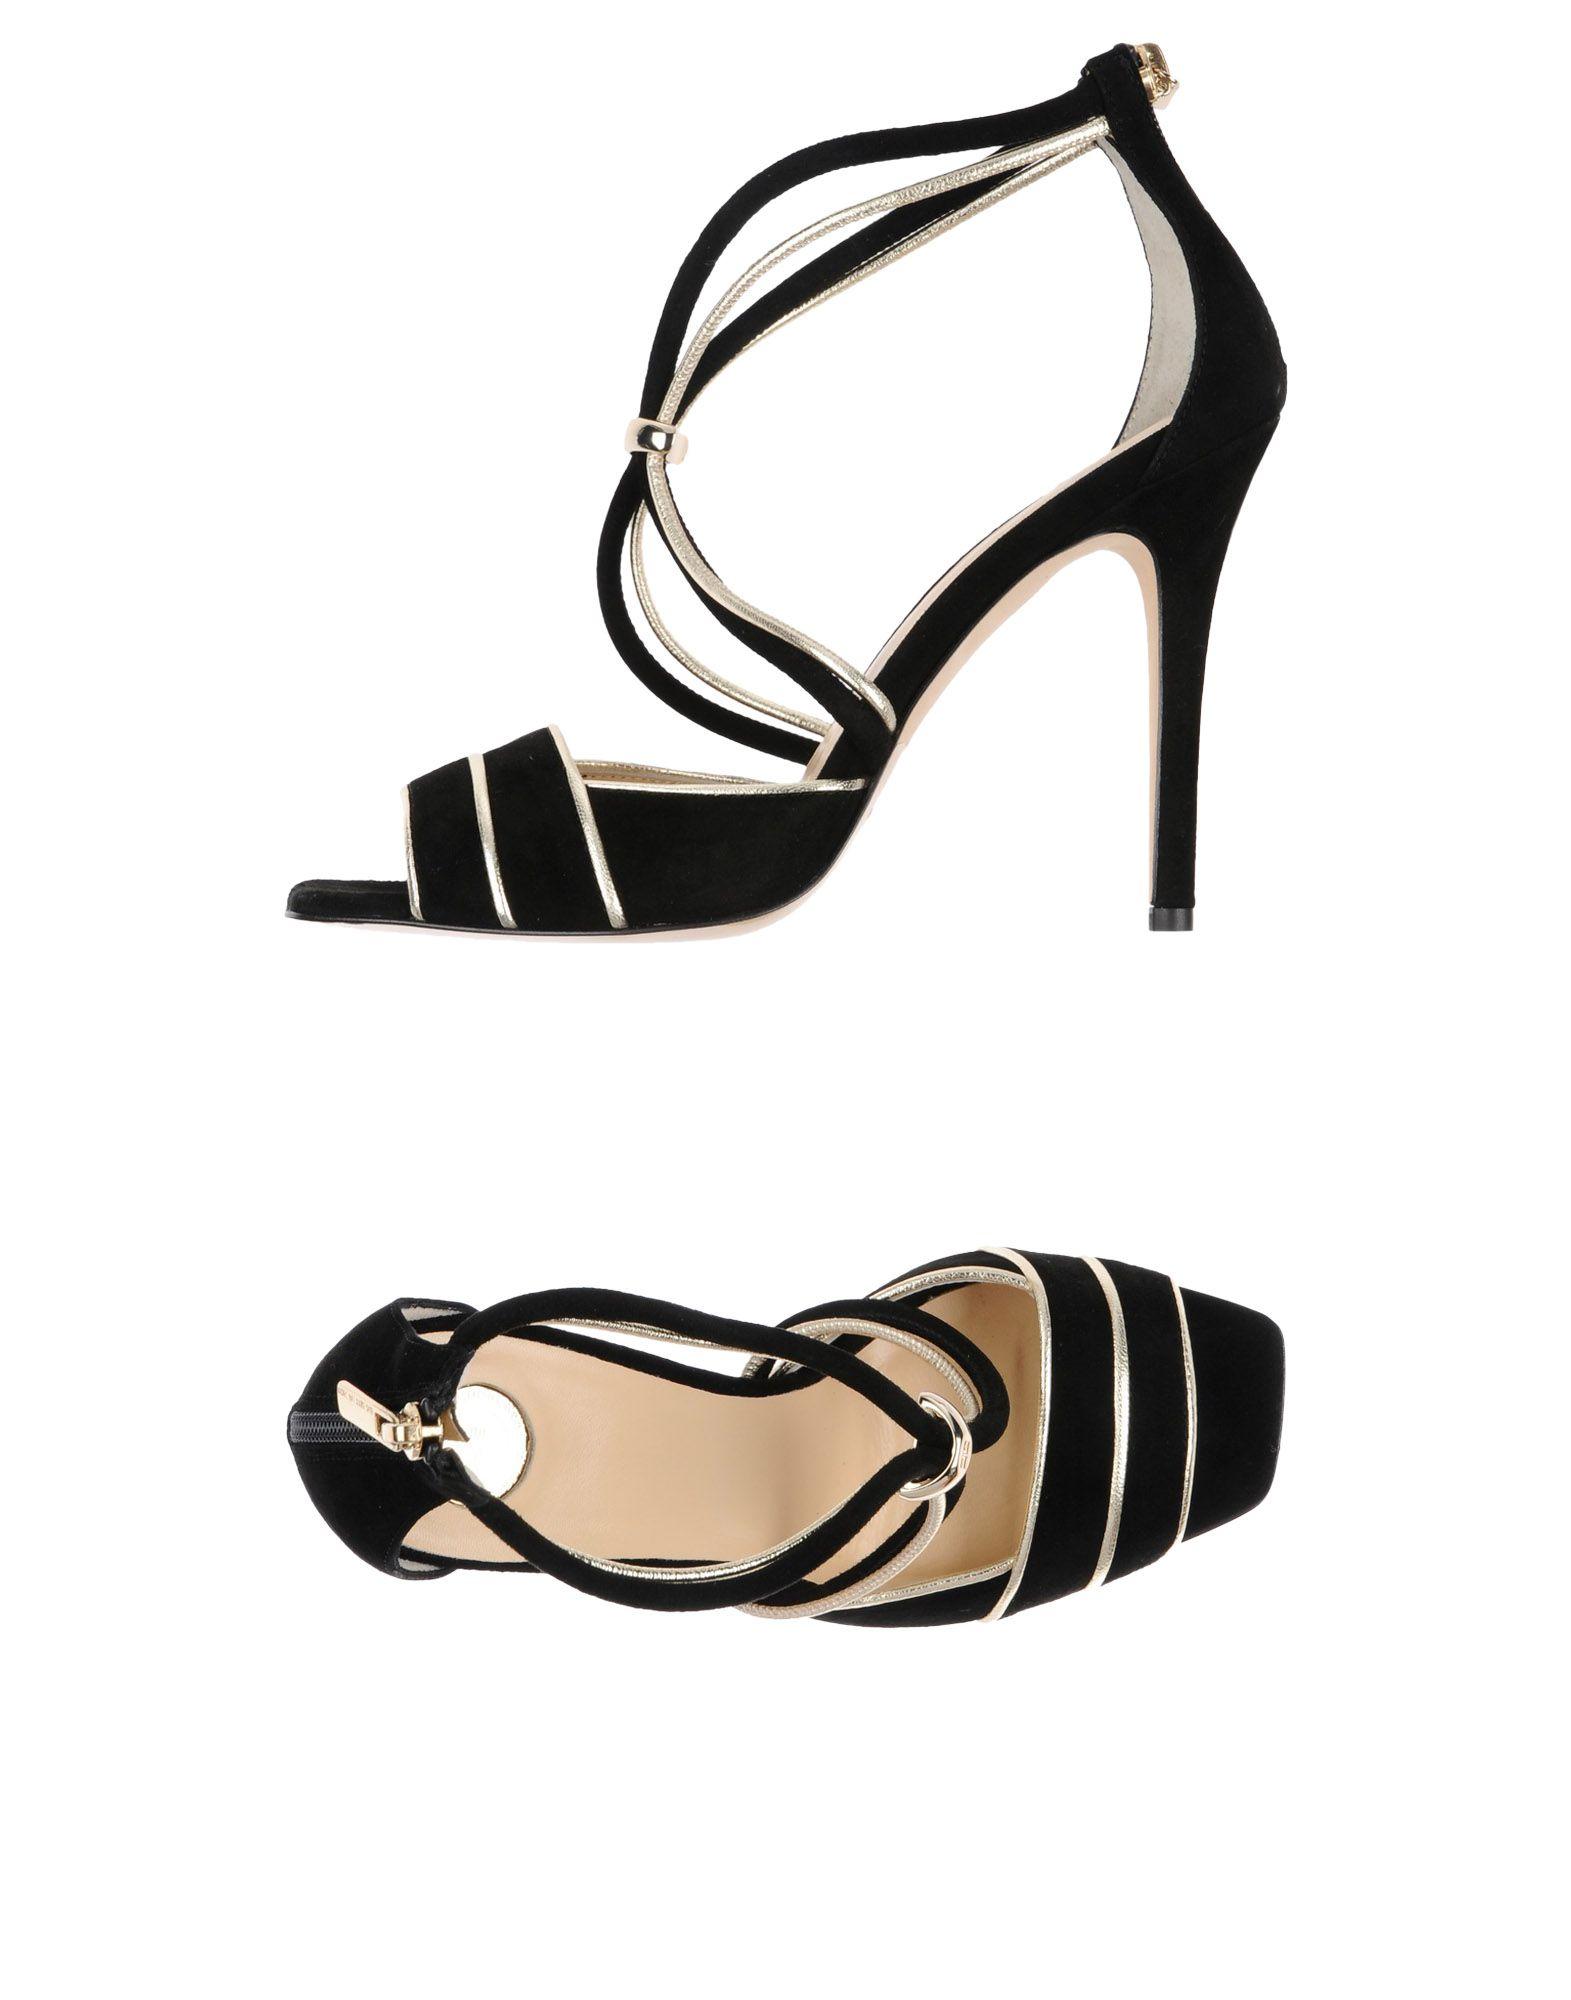 elisabetta franchi sandales - femmes elisabetta franchi les sandales sandales sandales en ligne le royaume - uni - 11251185dr 2edb1c